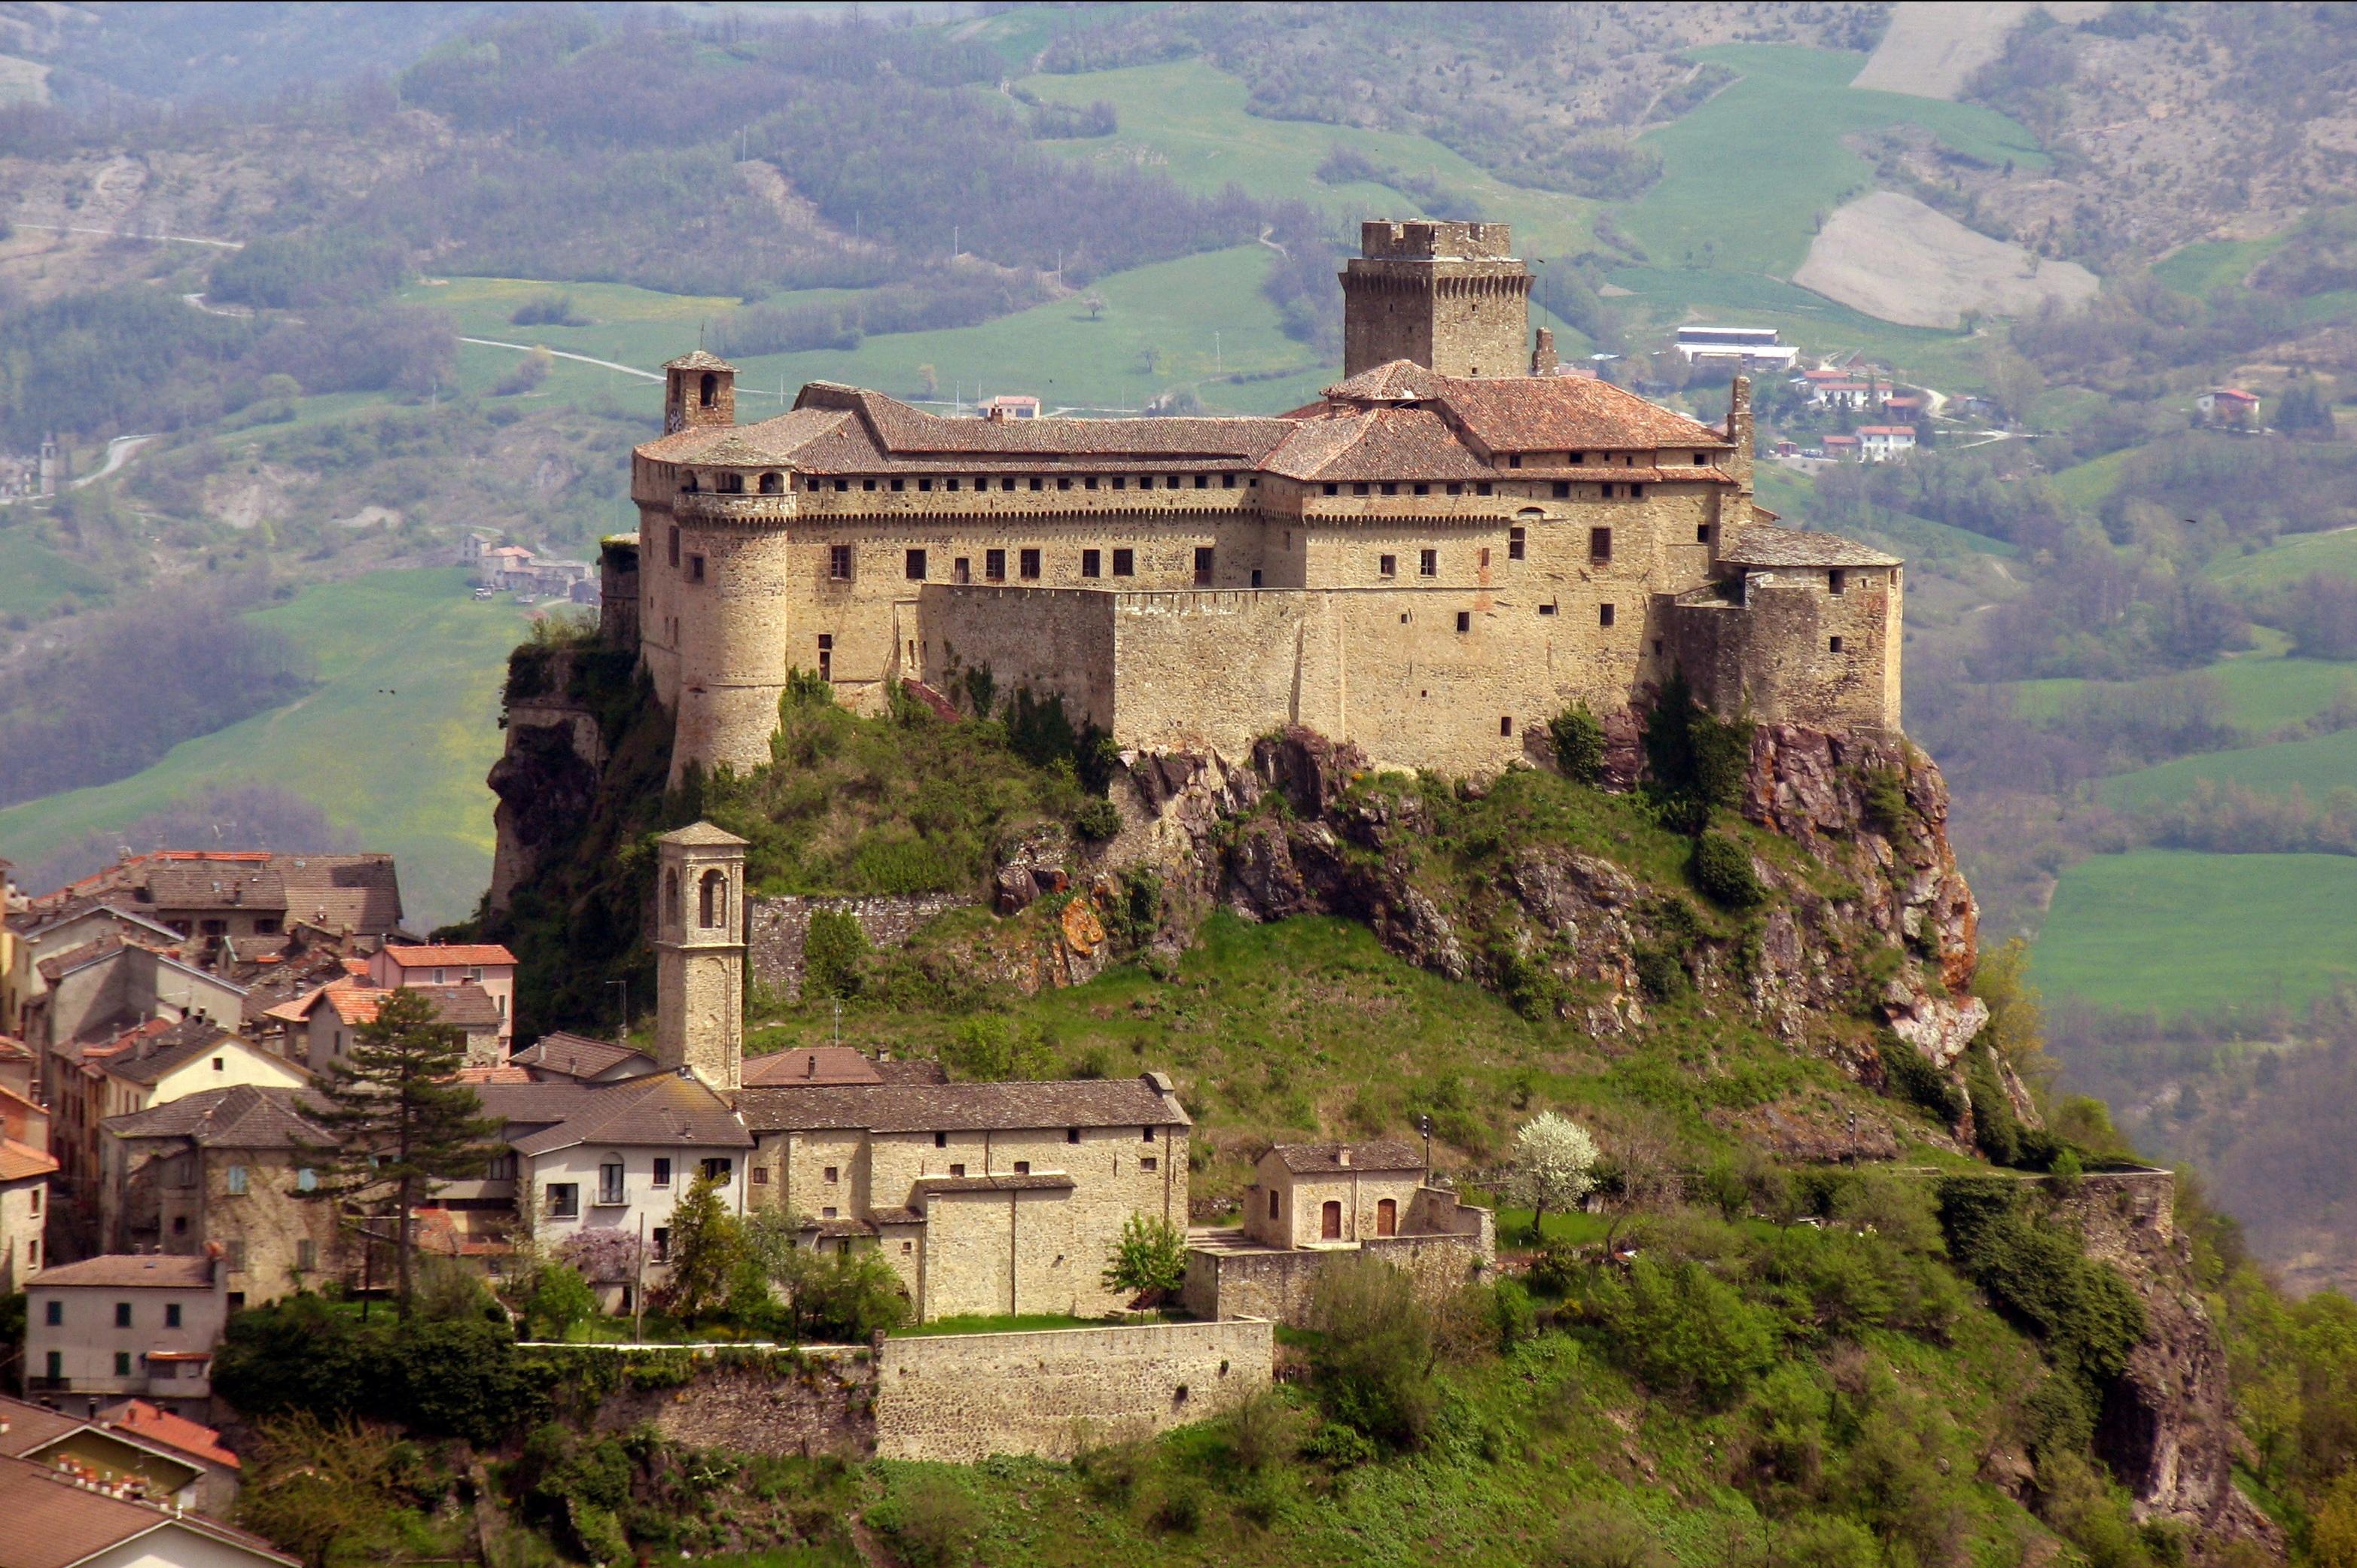 Bardi Castle, Italy